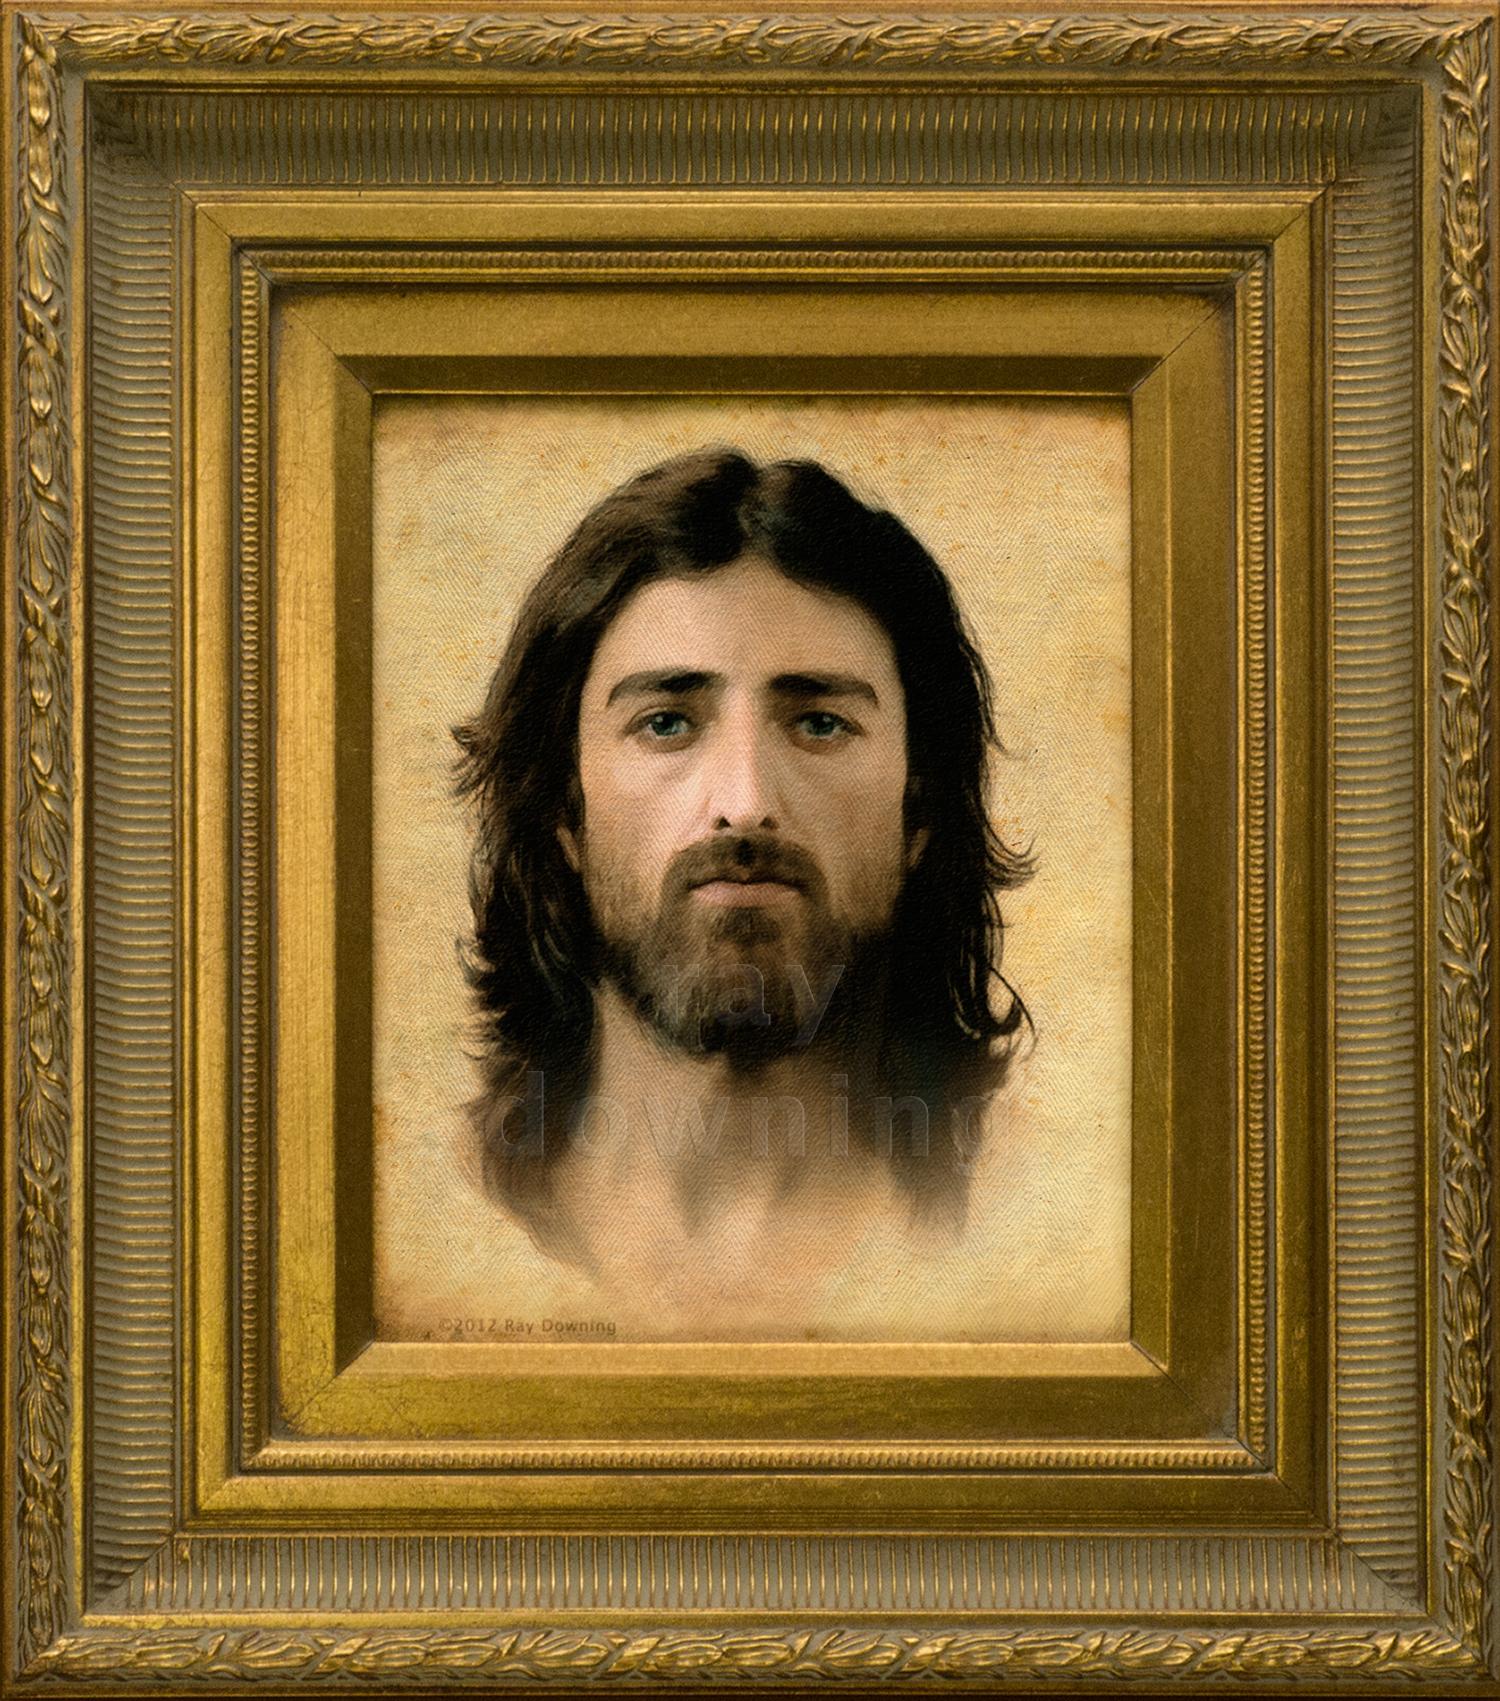 Jesus Store Ray Downing